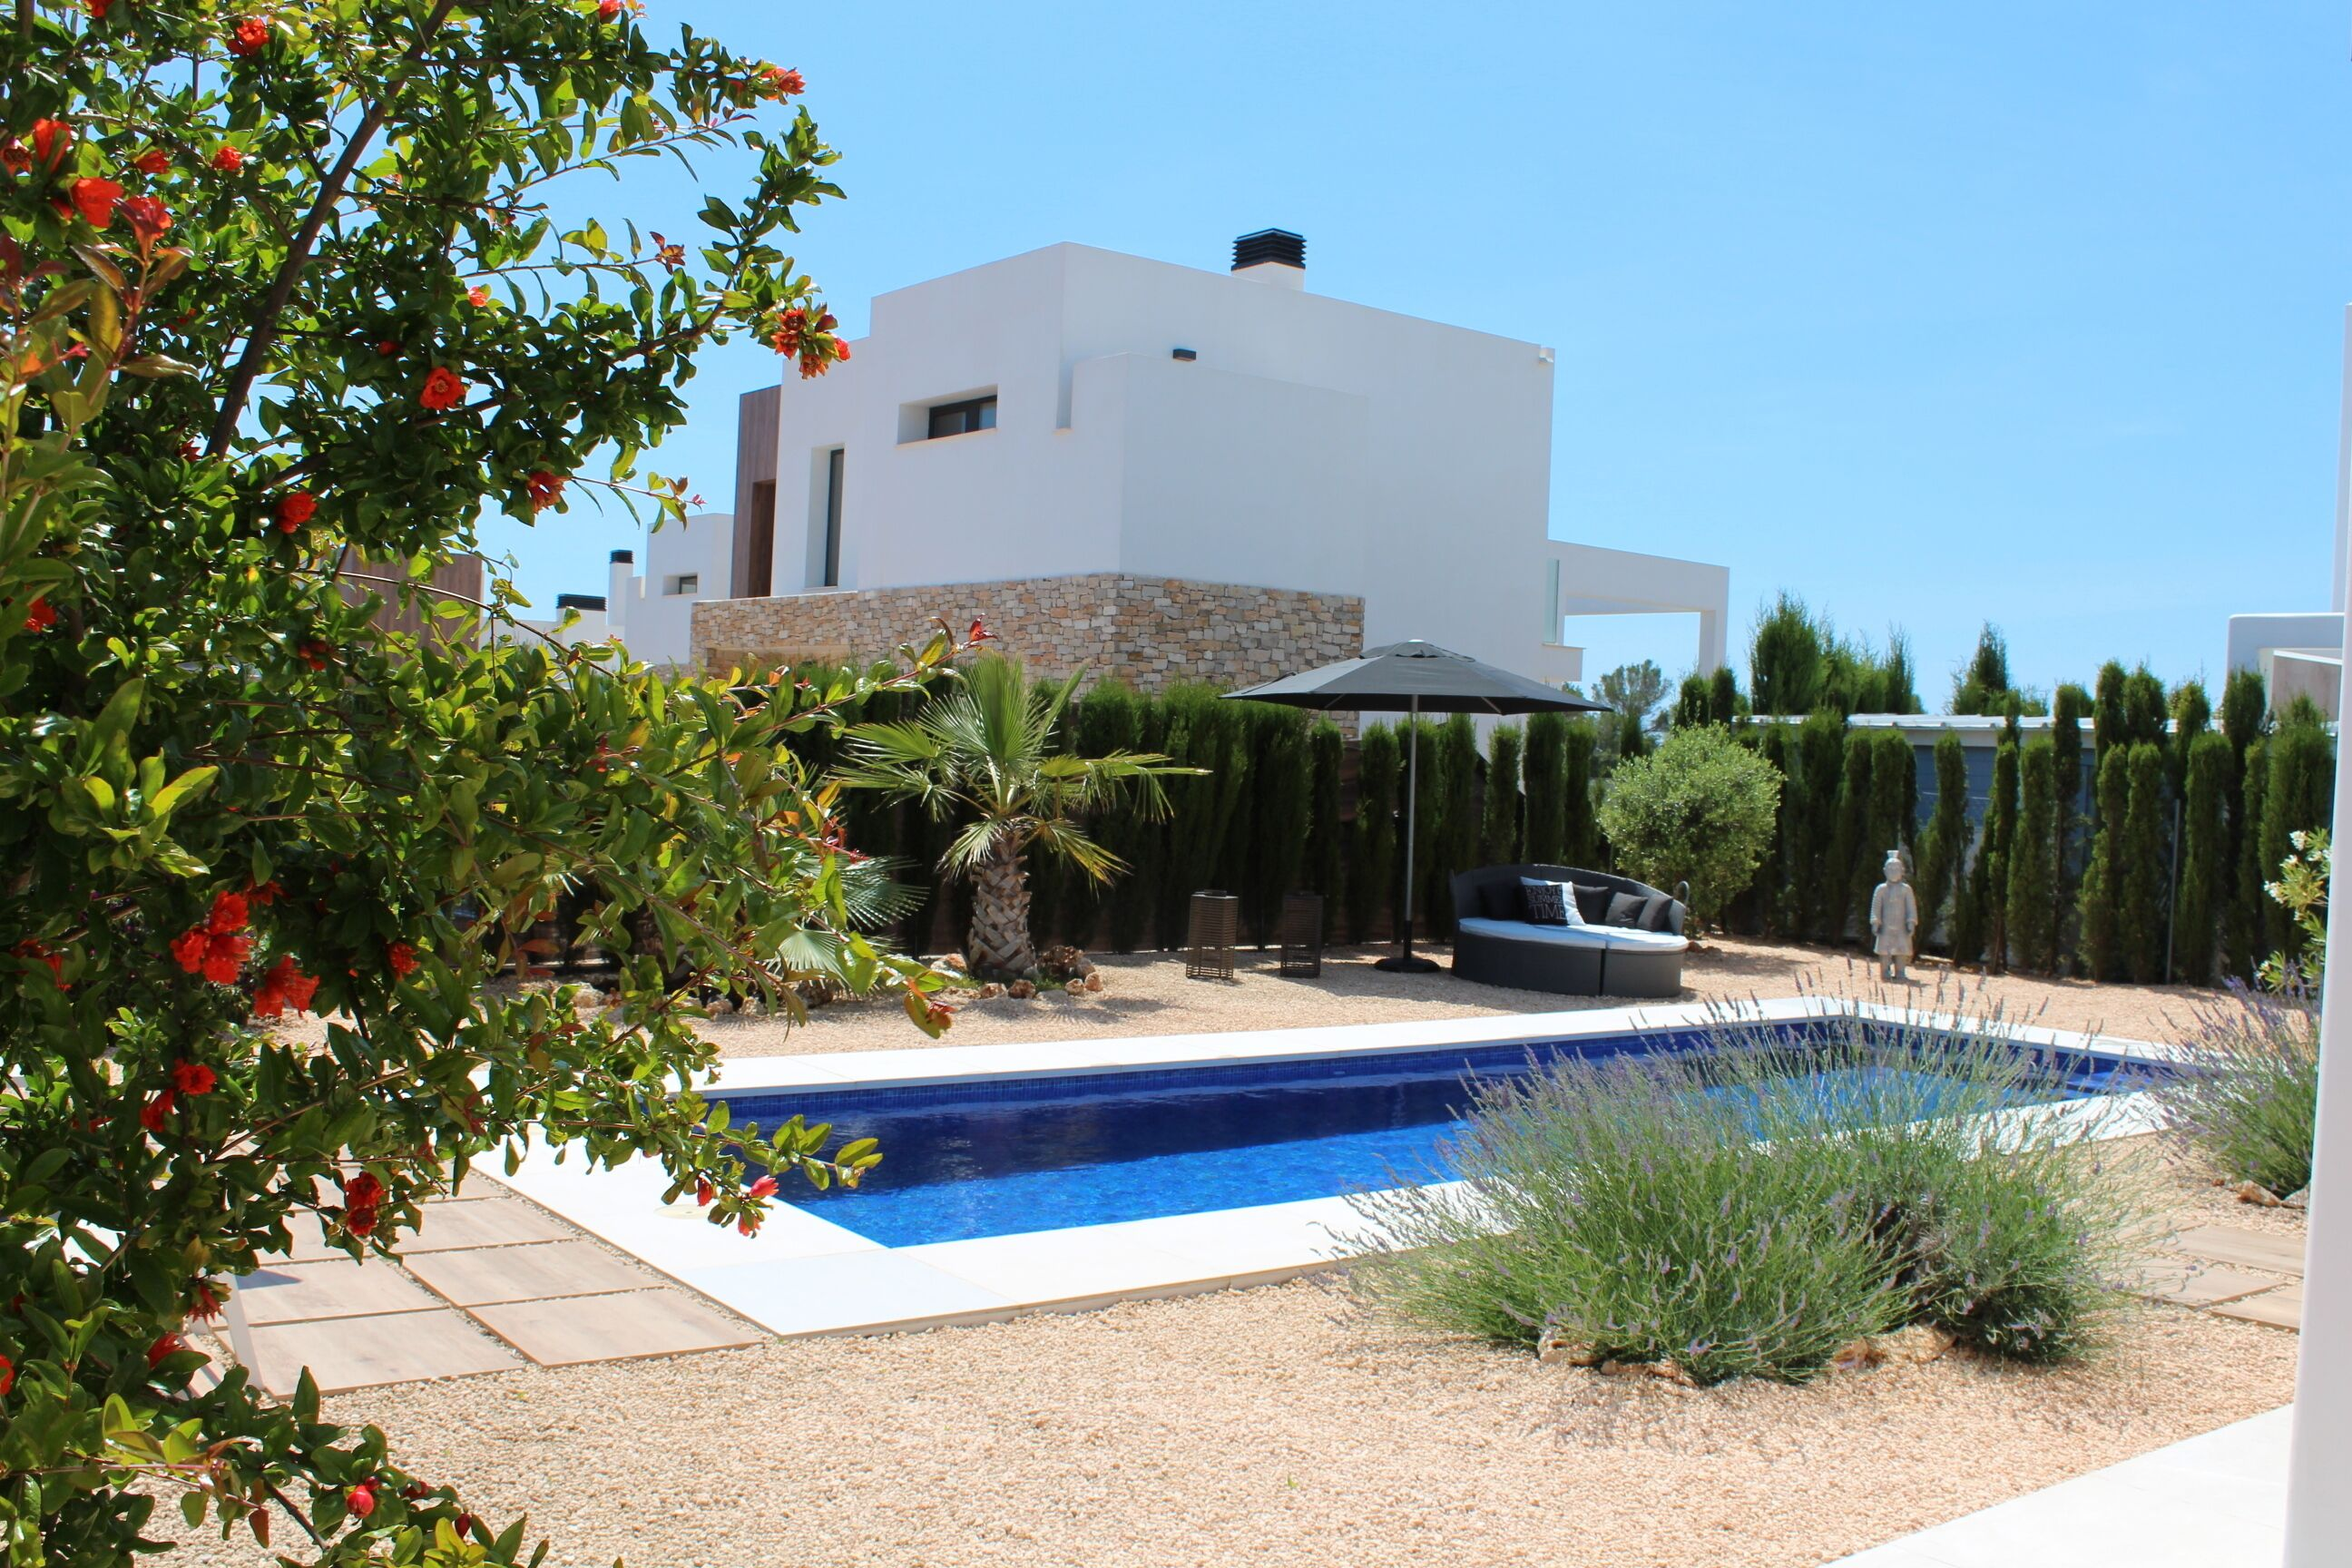 Picture of: Beachfront Design Villa In Bauhaus Style Pool Highspeed Internet Air Conditioning Heating Manacor Spanien Expedia Dk